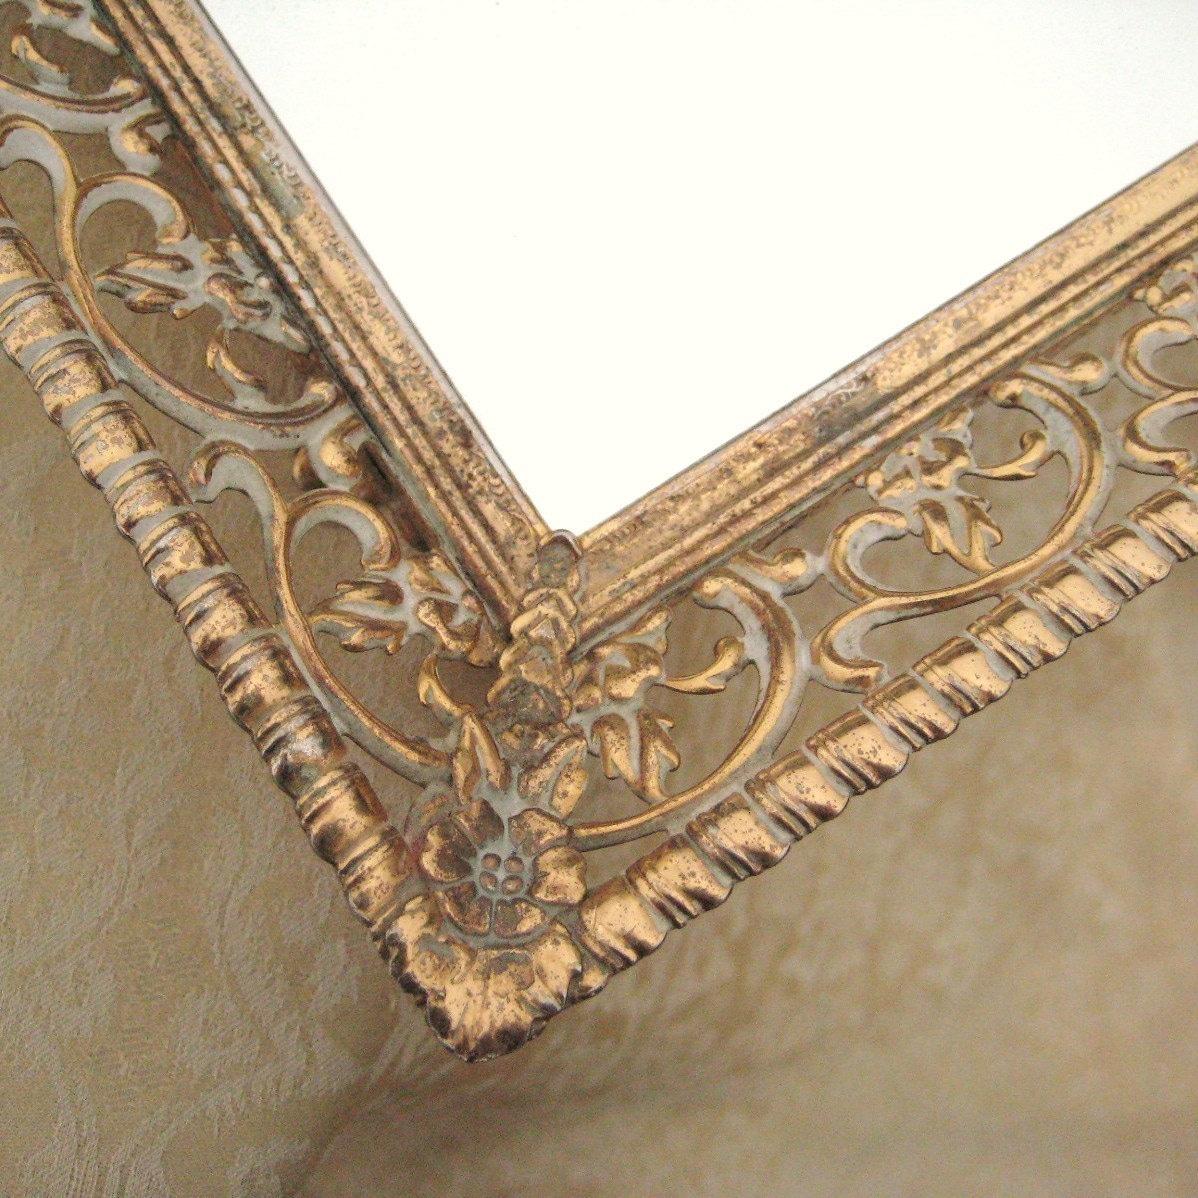 Large Ornate Vintage Metal Filigree Mirrored Vanity Tray